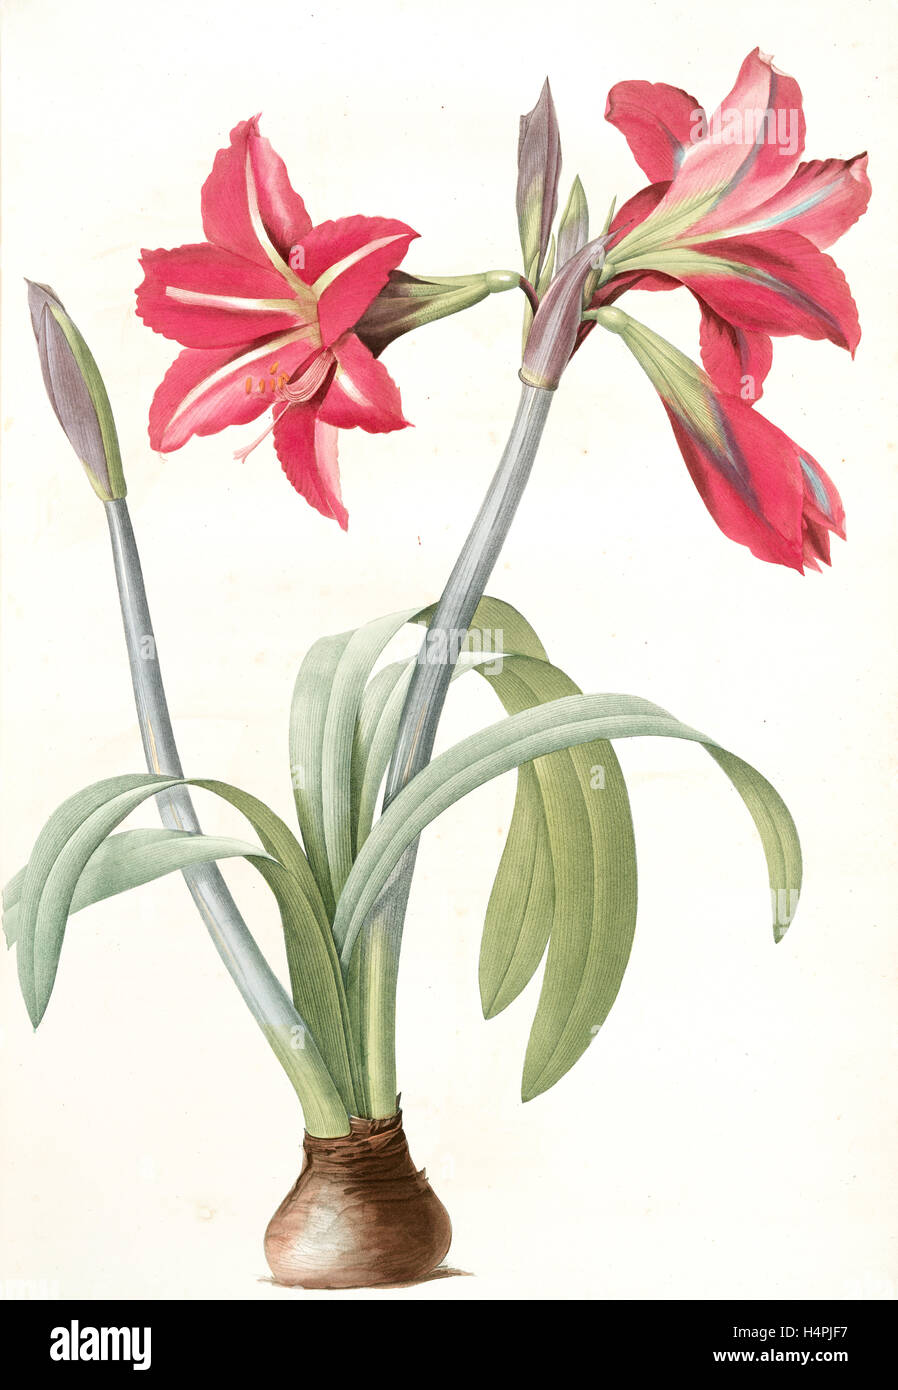 Amaryllis brasiliensis, Hippeastrum equestre; Amaryllis brèsilienne; Barbados Lily, Redouté, Pierre Joseph, - Stock Image